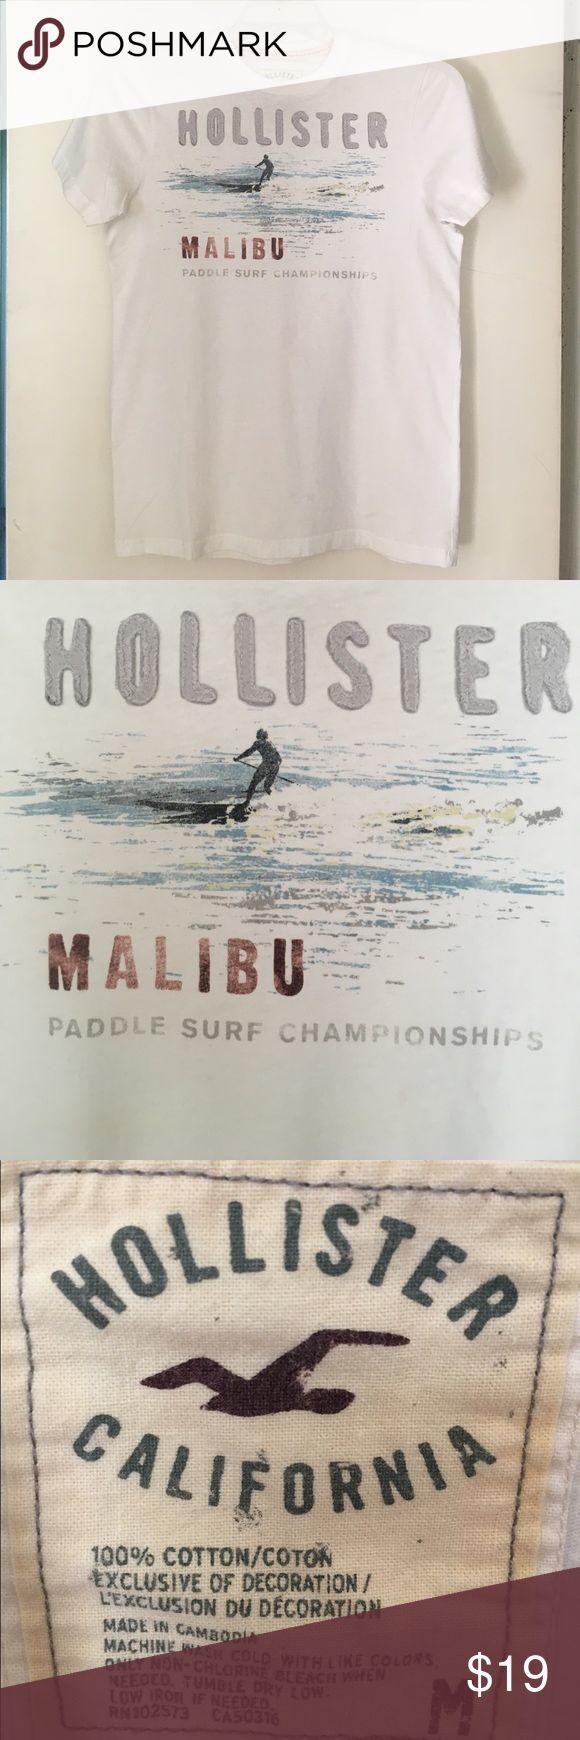 Hollister Malibu Paddle Surf Championship Sz M. Hollister Malibu Paddle Surf Championship Sz M. White w/Dove Gray Raised Lettering & Blue & Gray Paddle Boarding Image. Size Medium. 🚫Trade Hollister Shirts